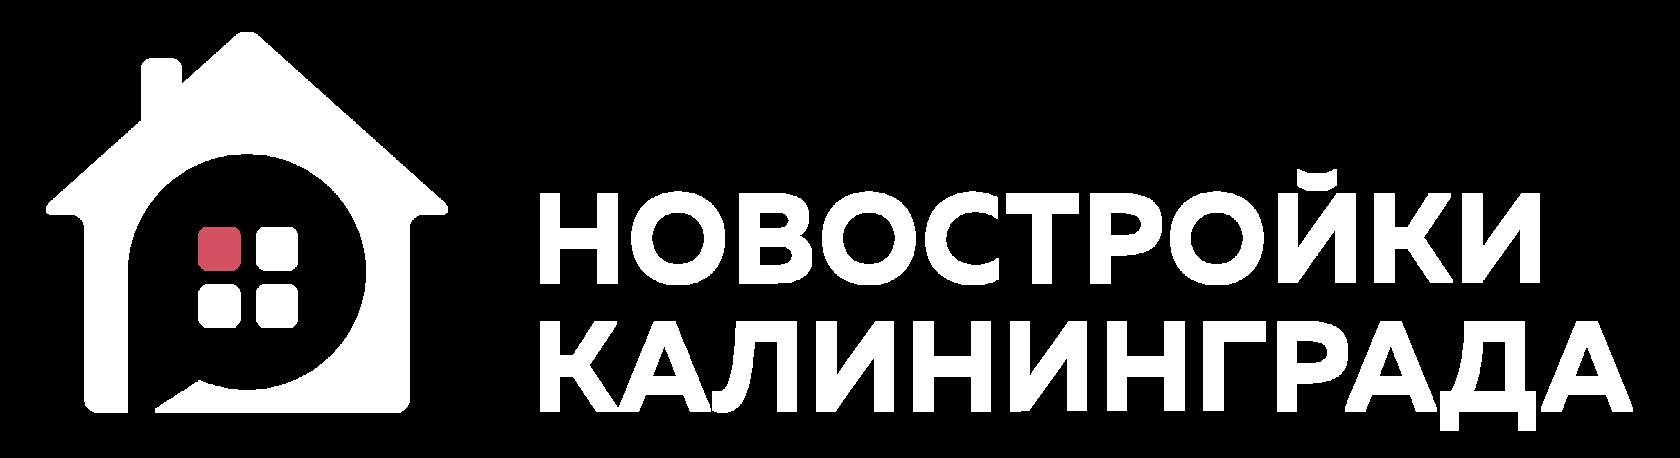 Новостройки Калининграда